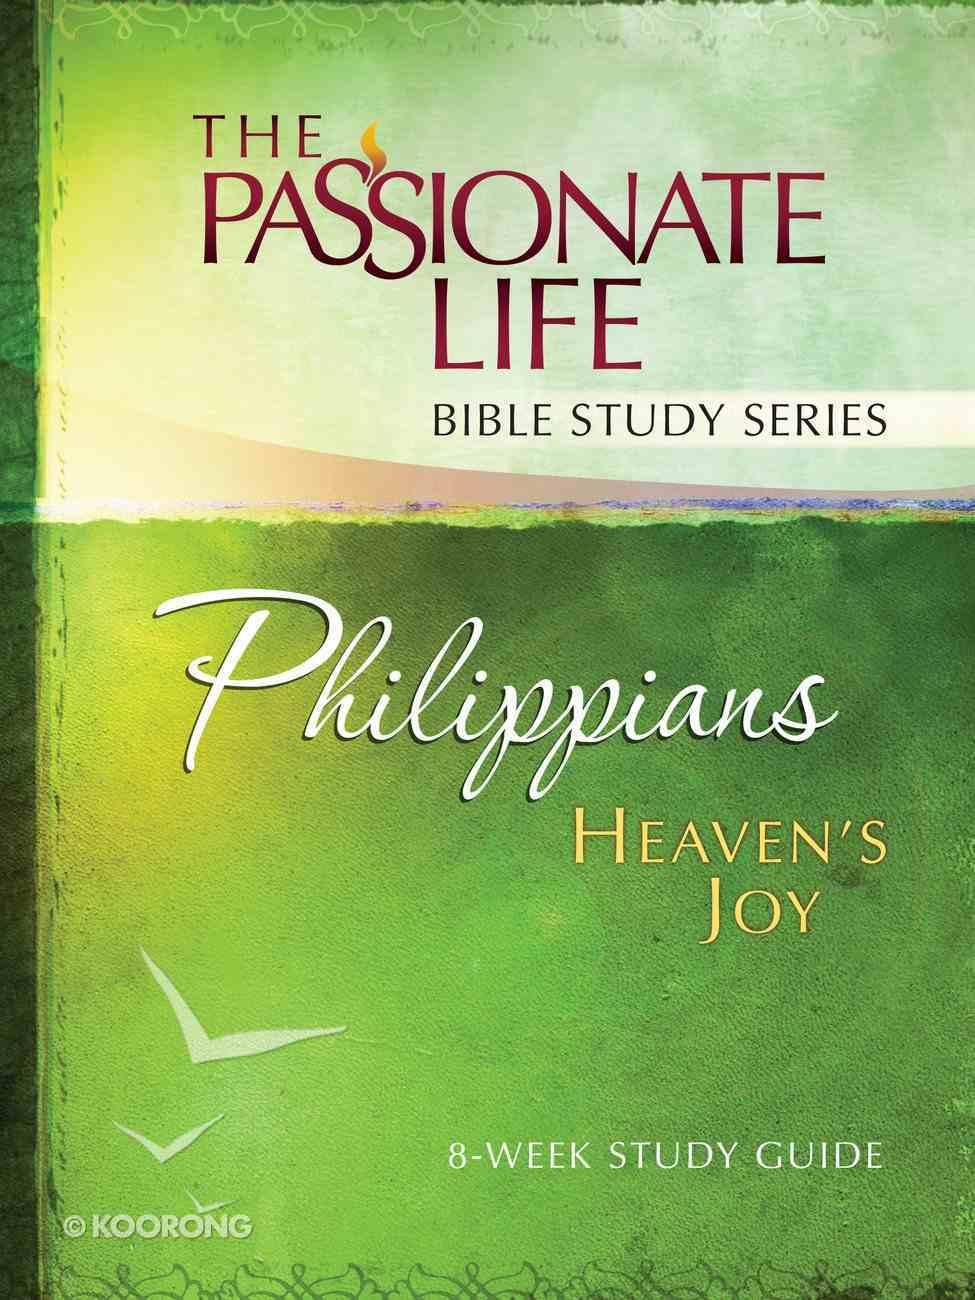 Philippians - Heaven's Joy (The Passionate Life Bible Study Series) eBook